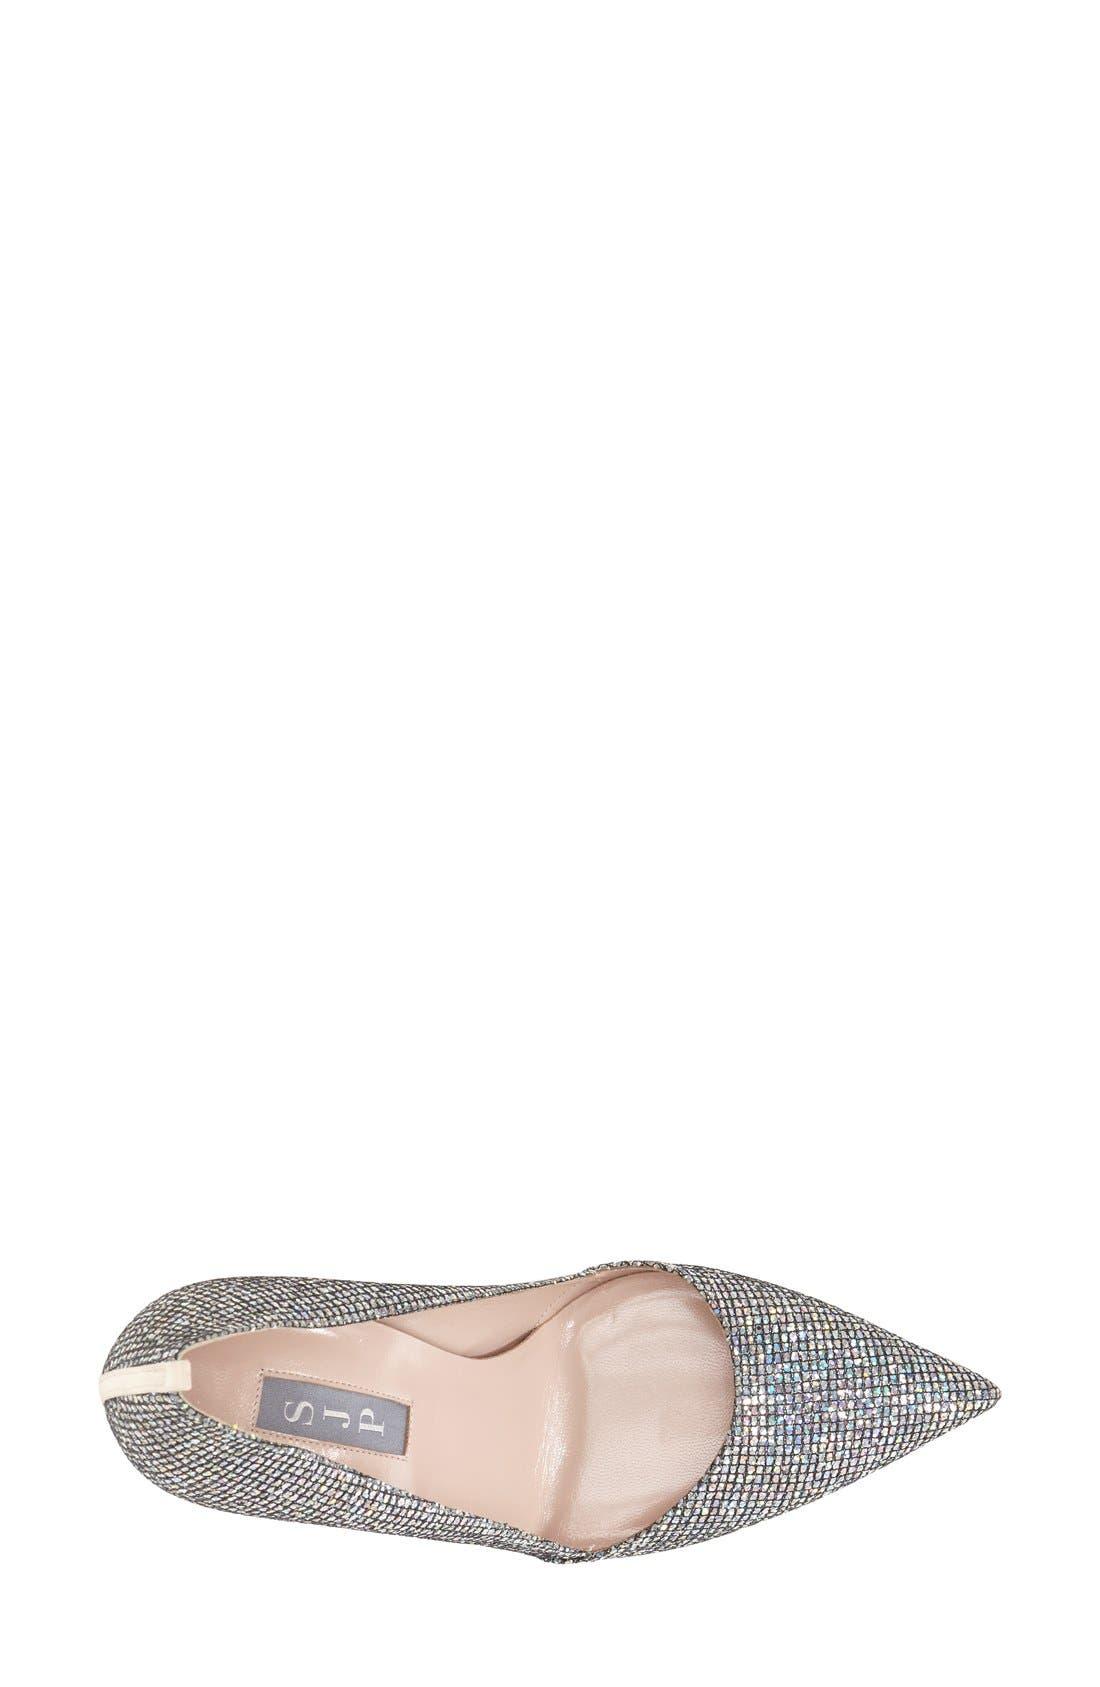 Alternate Image 3  - SJP by Sarah Jessica Parker 'Rampling' Pump (Women)